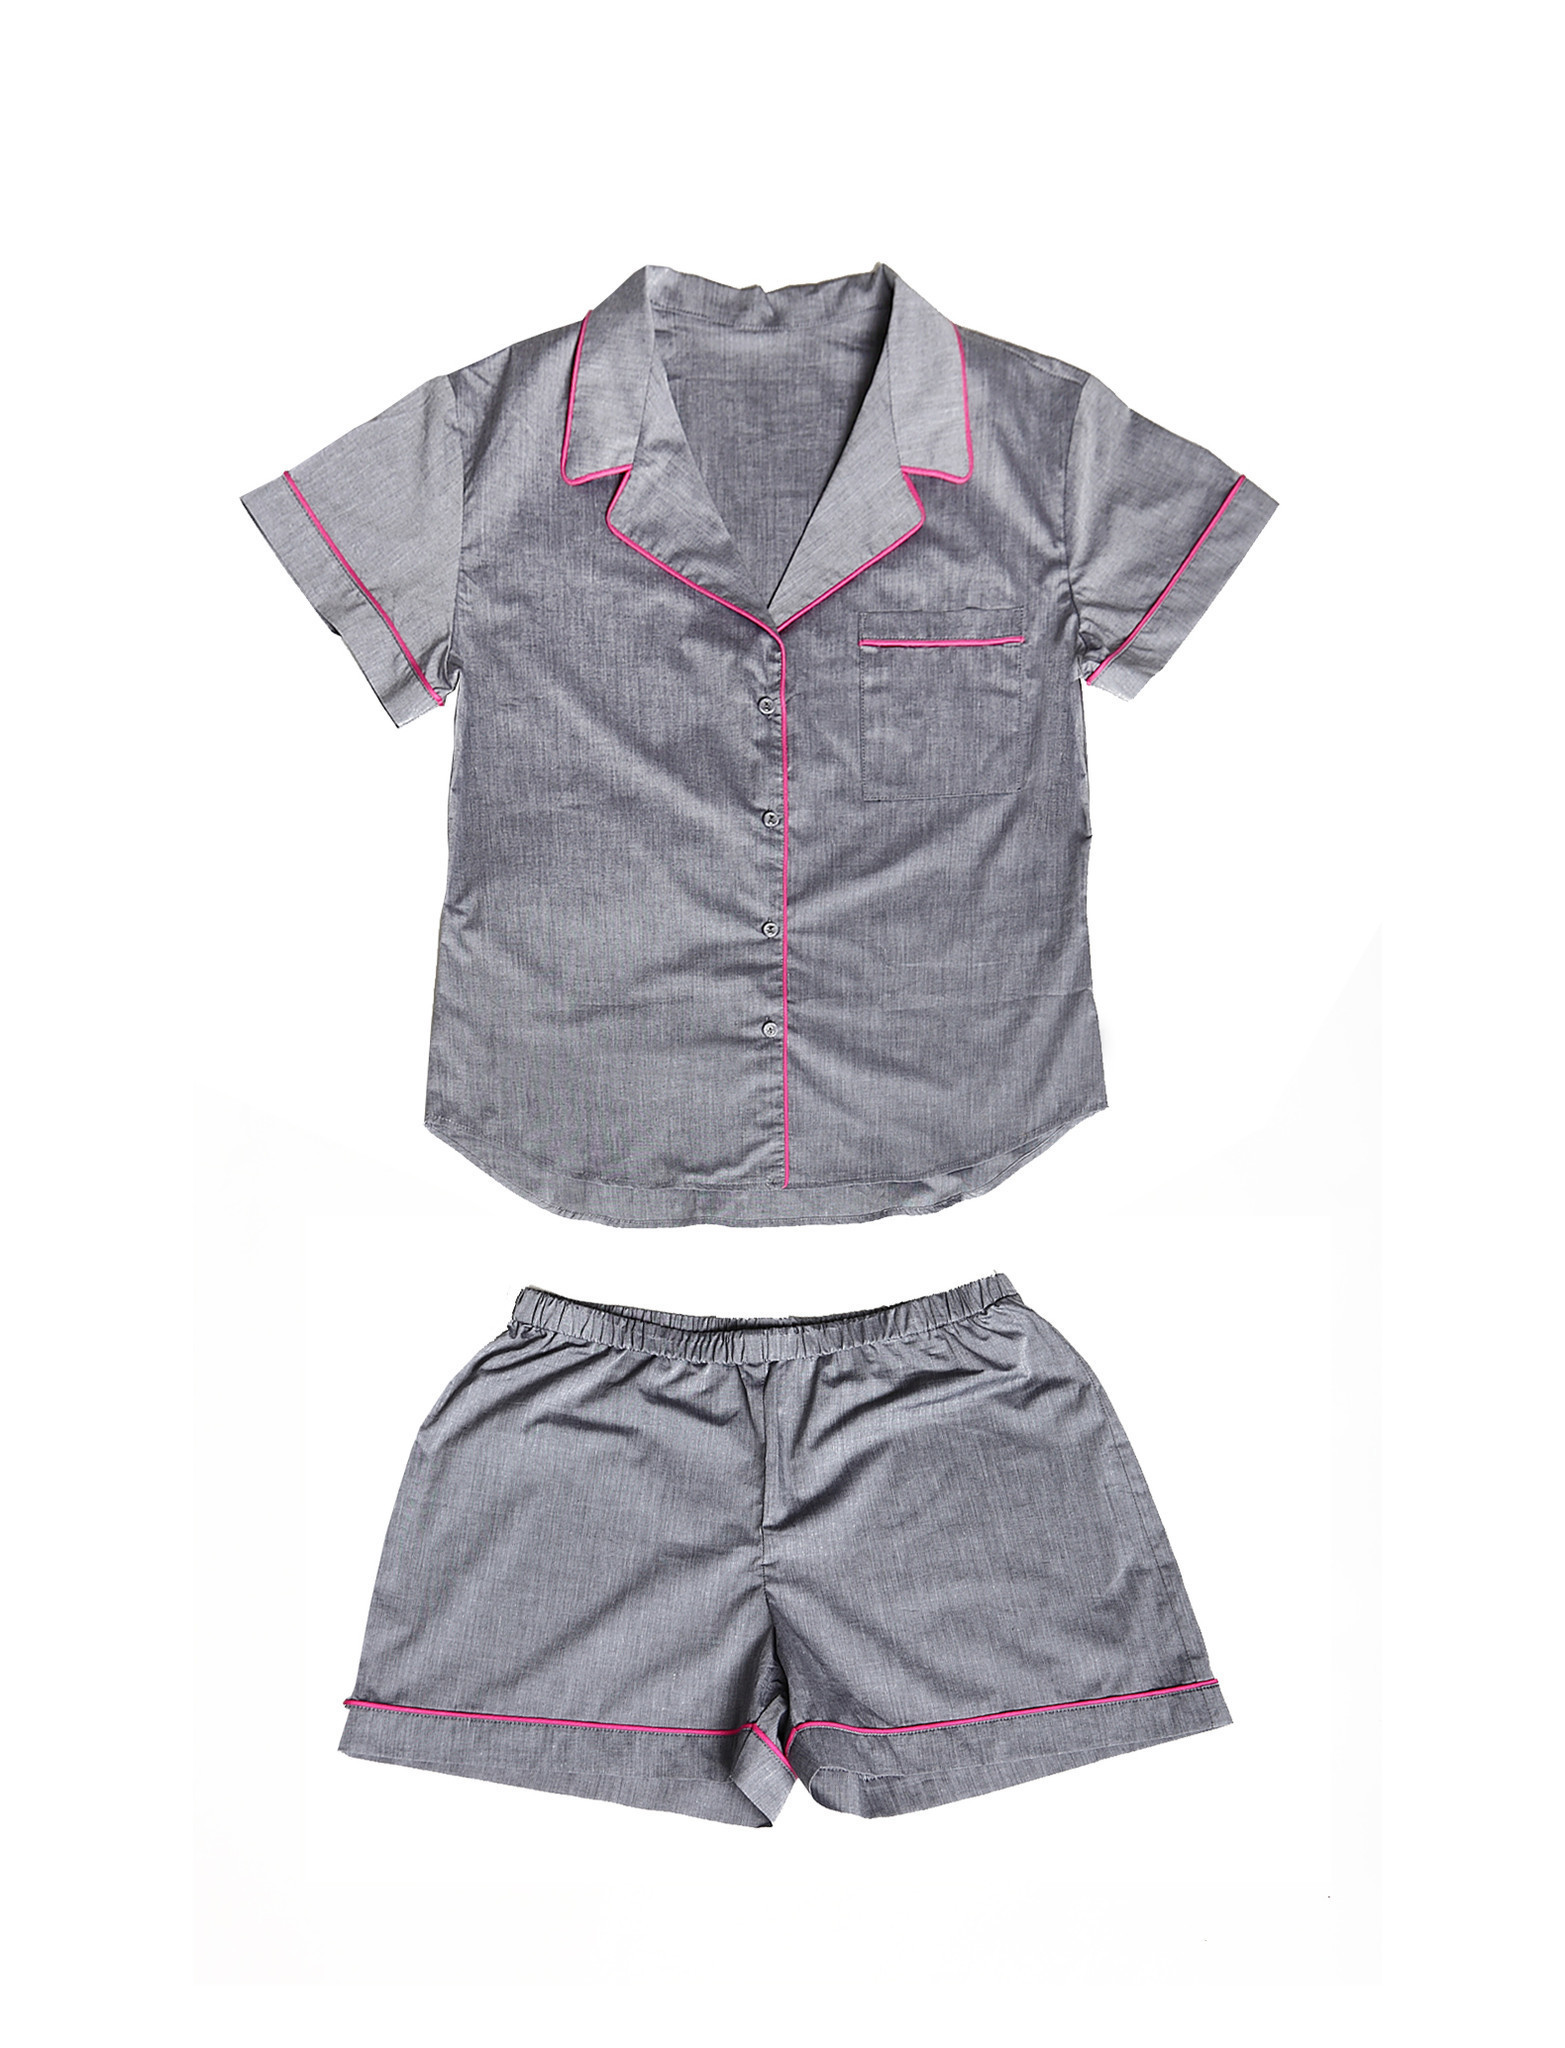 7eee5a4f4c Designer pajamas at W South Beach - Sun Sentinel